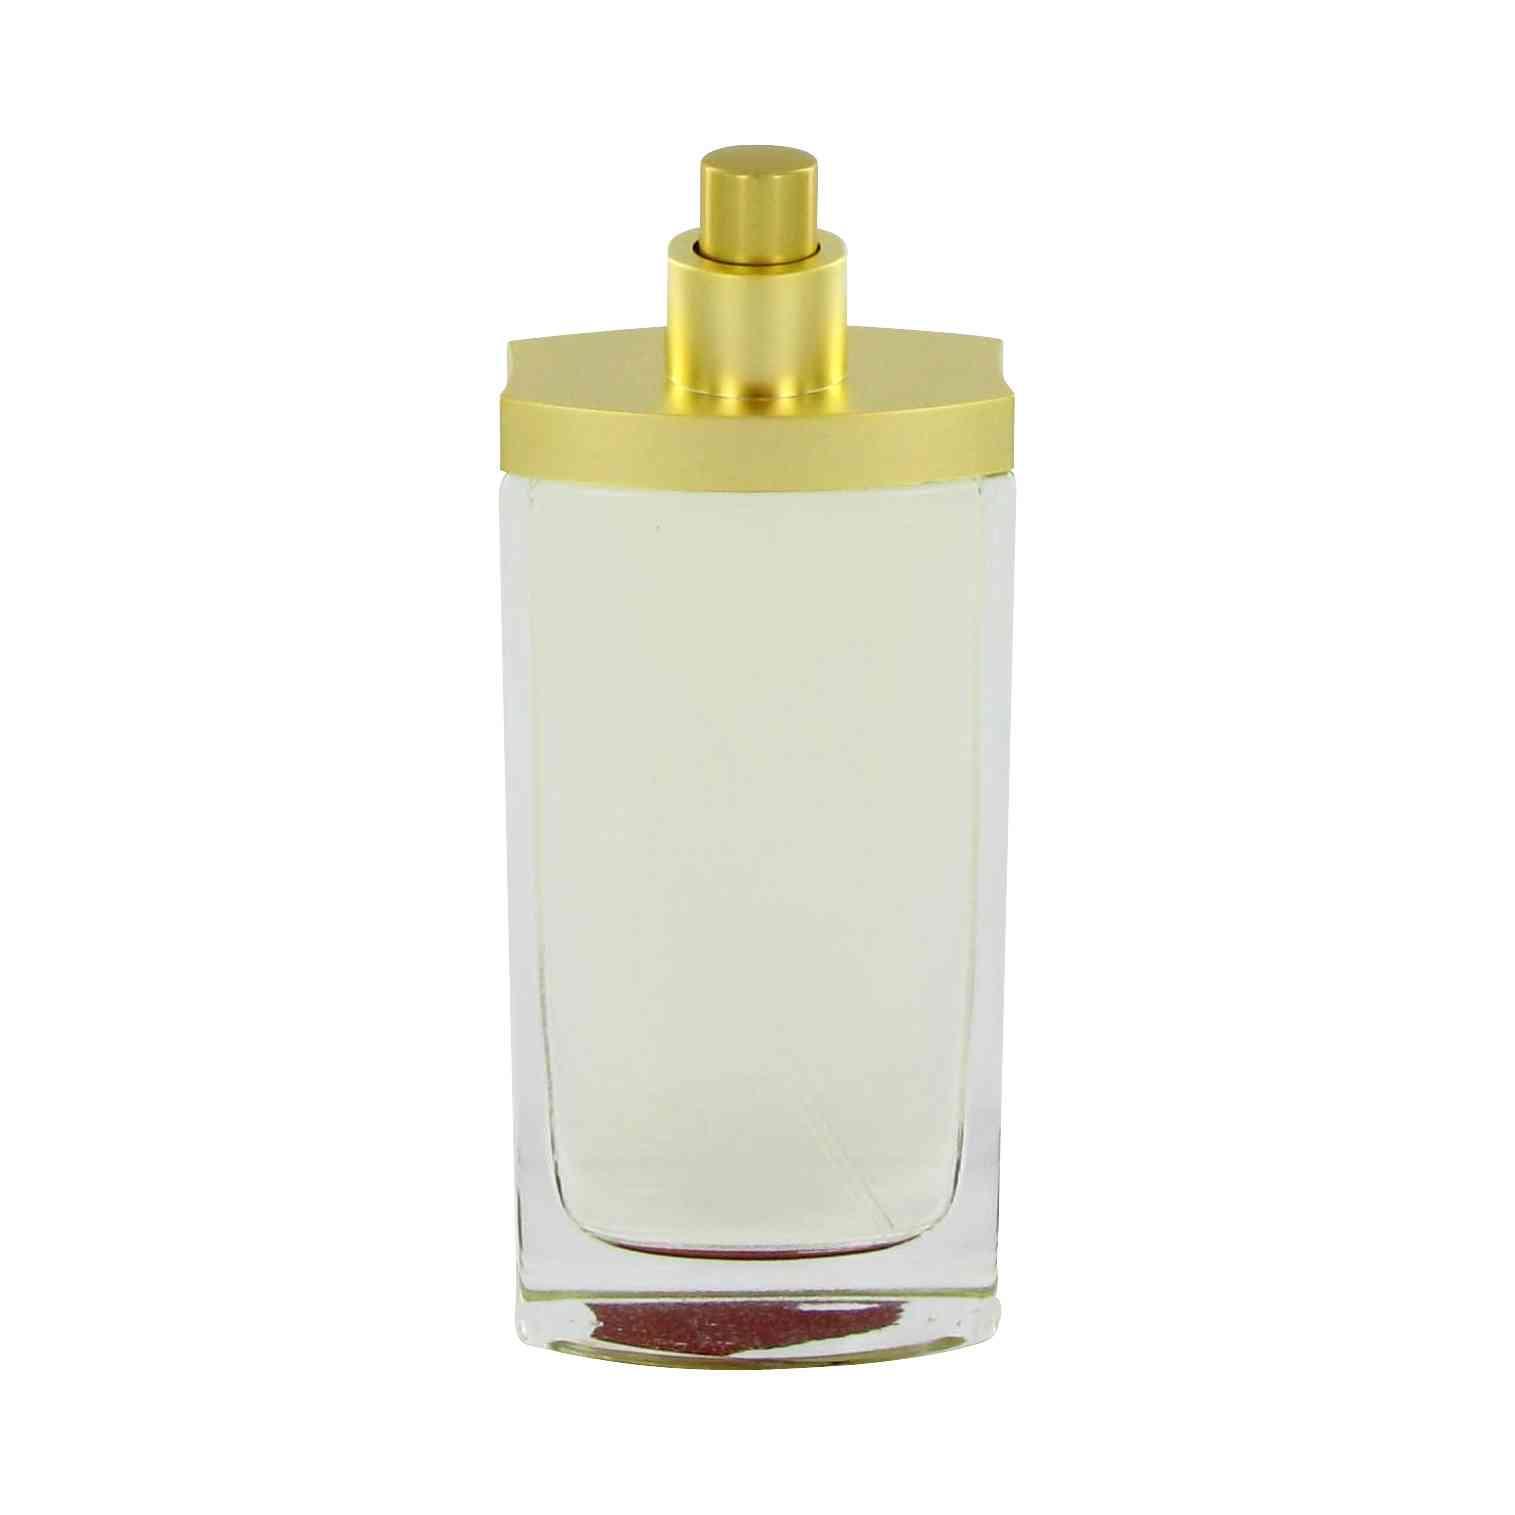 Elizabeth Arden Beauty Women's 3.4-ounce Eau de Parfum Spray (Tester)